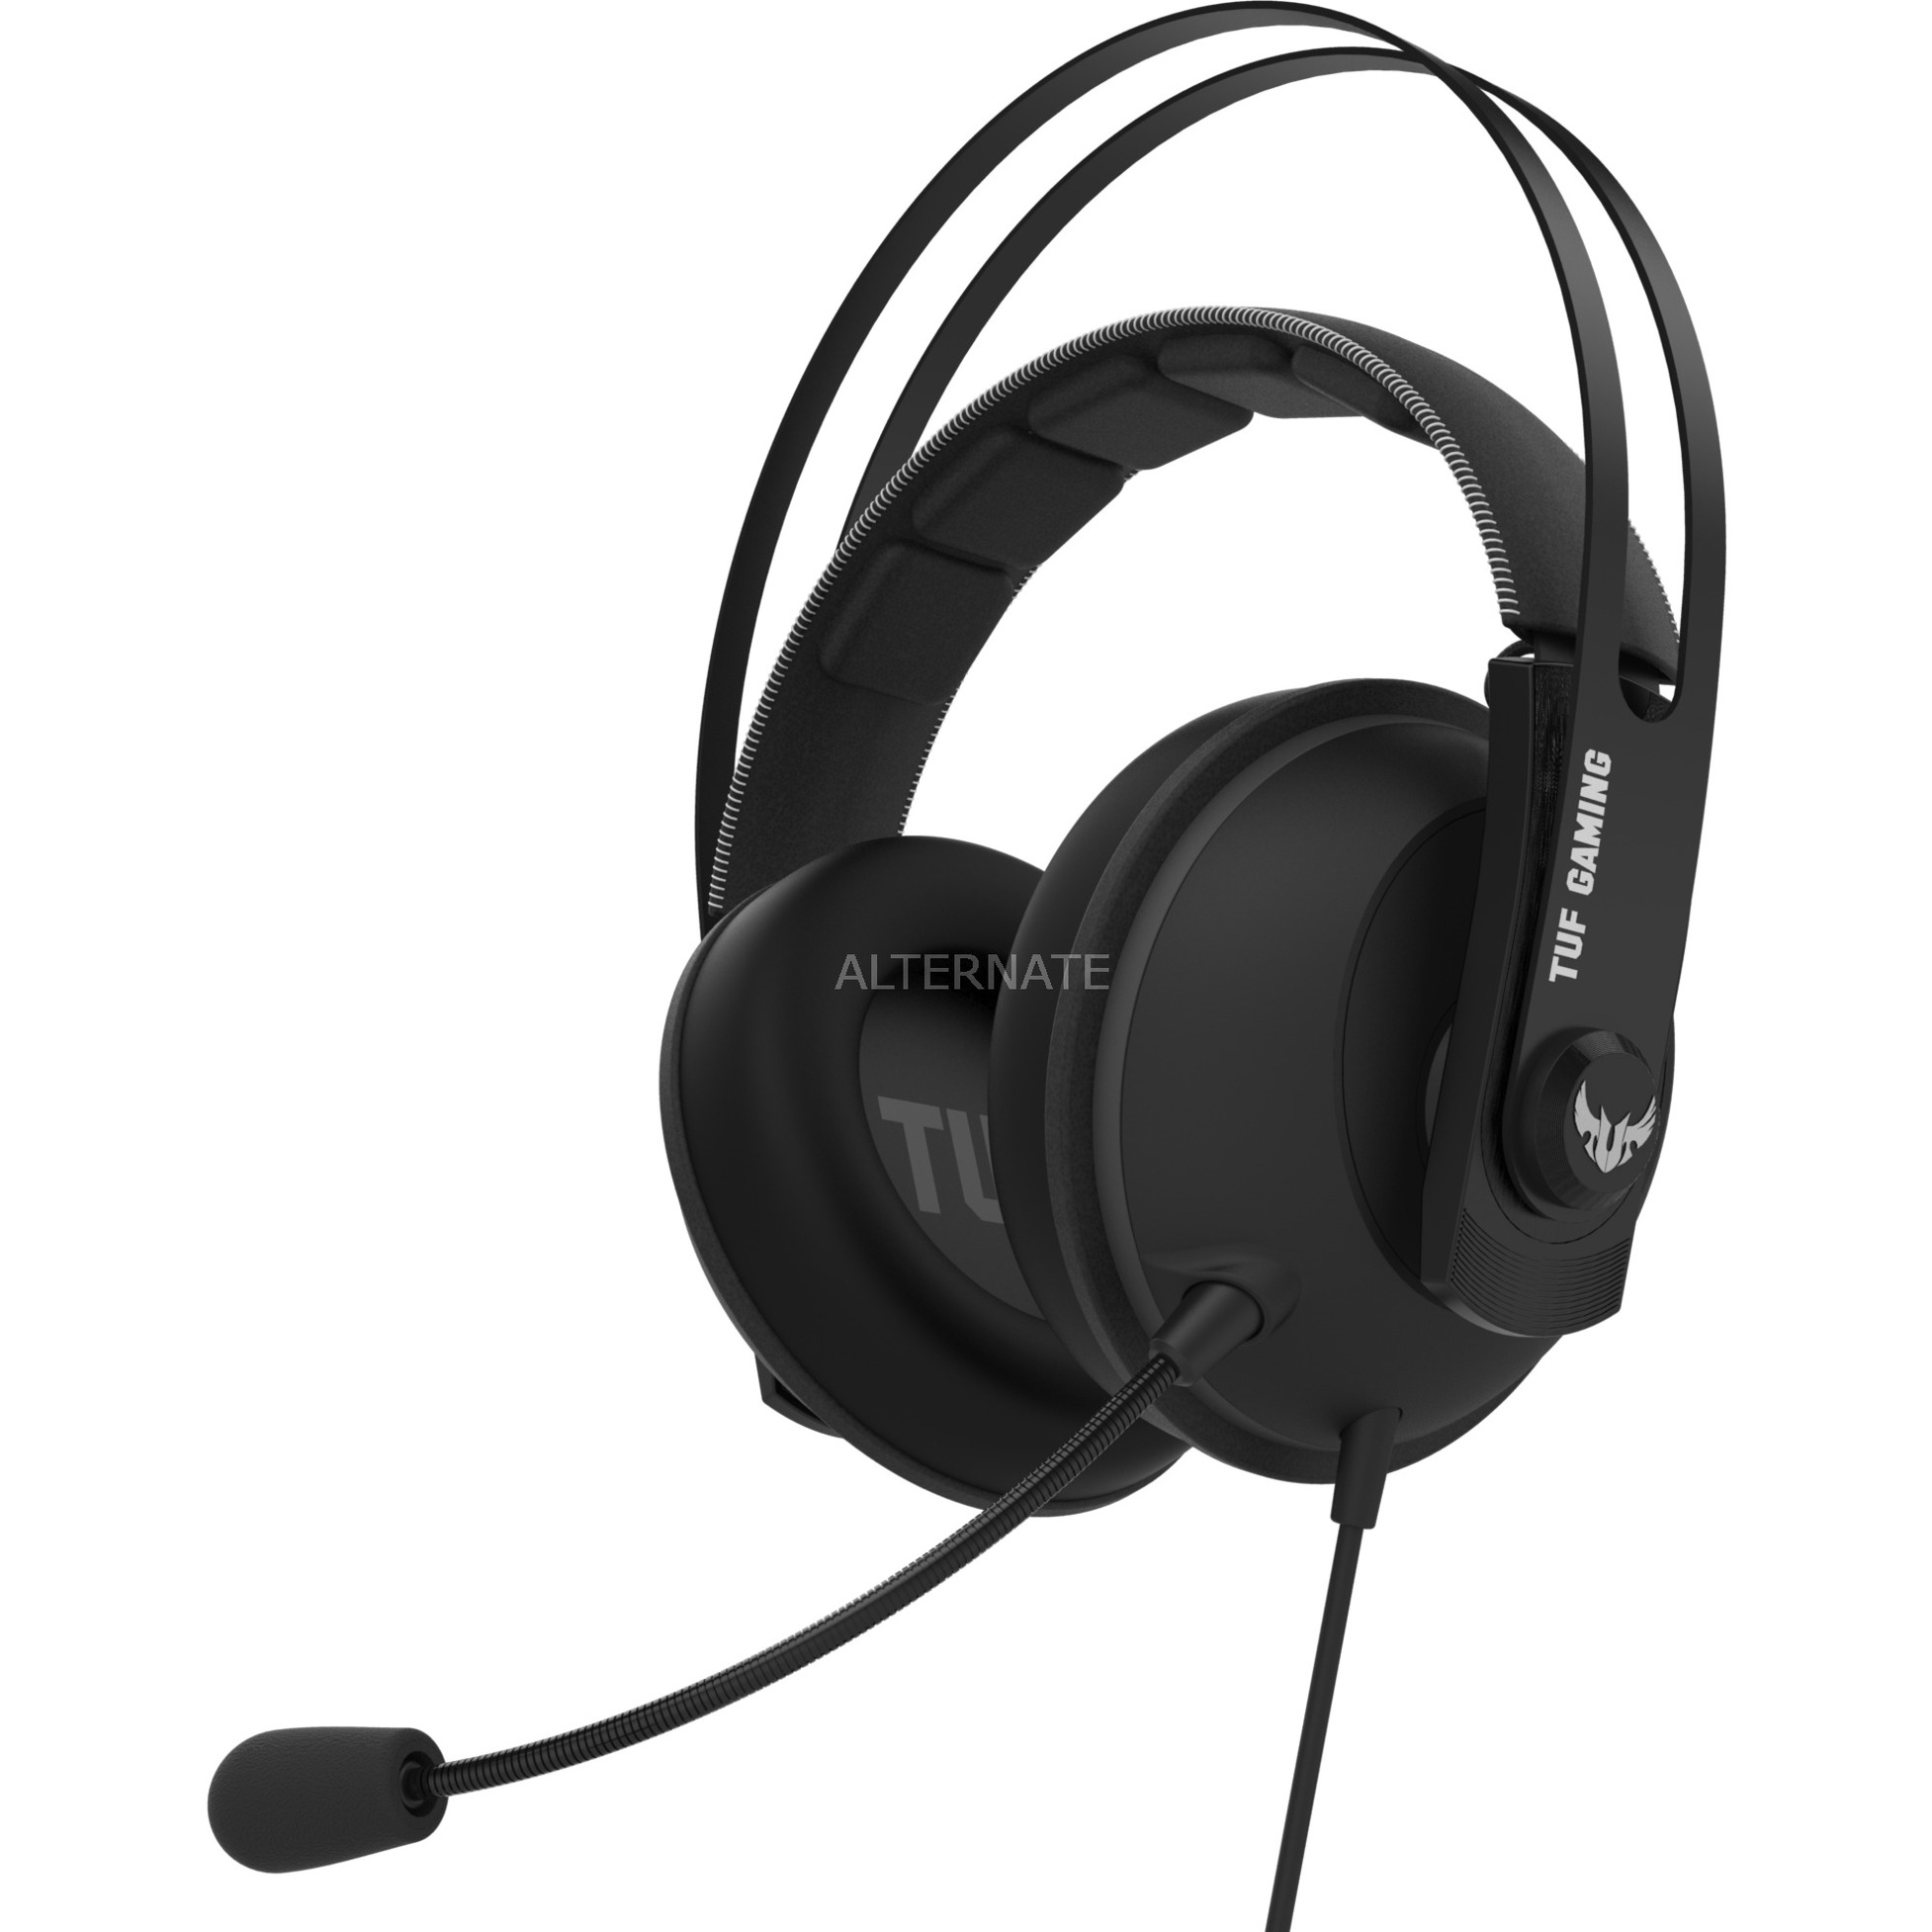 90YH021G-B1UA00, Auriculares con micrófono